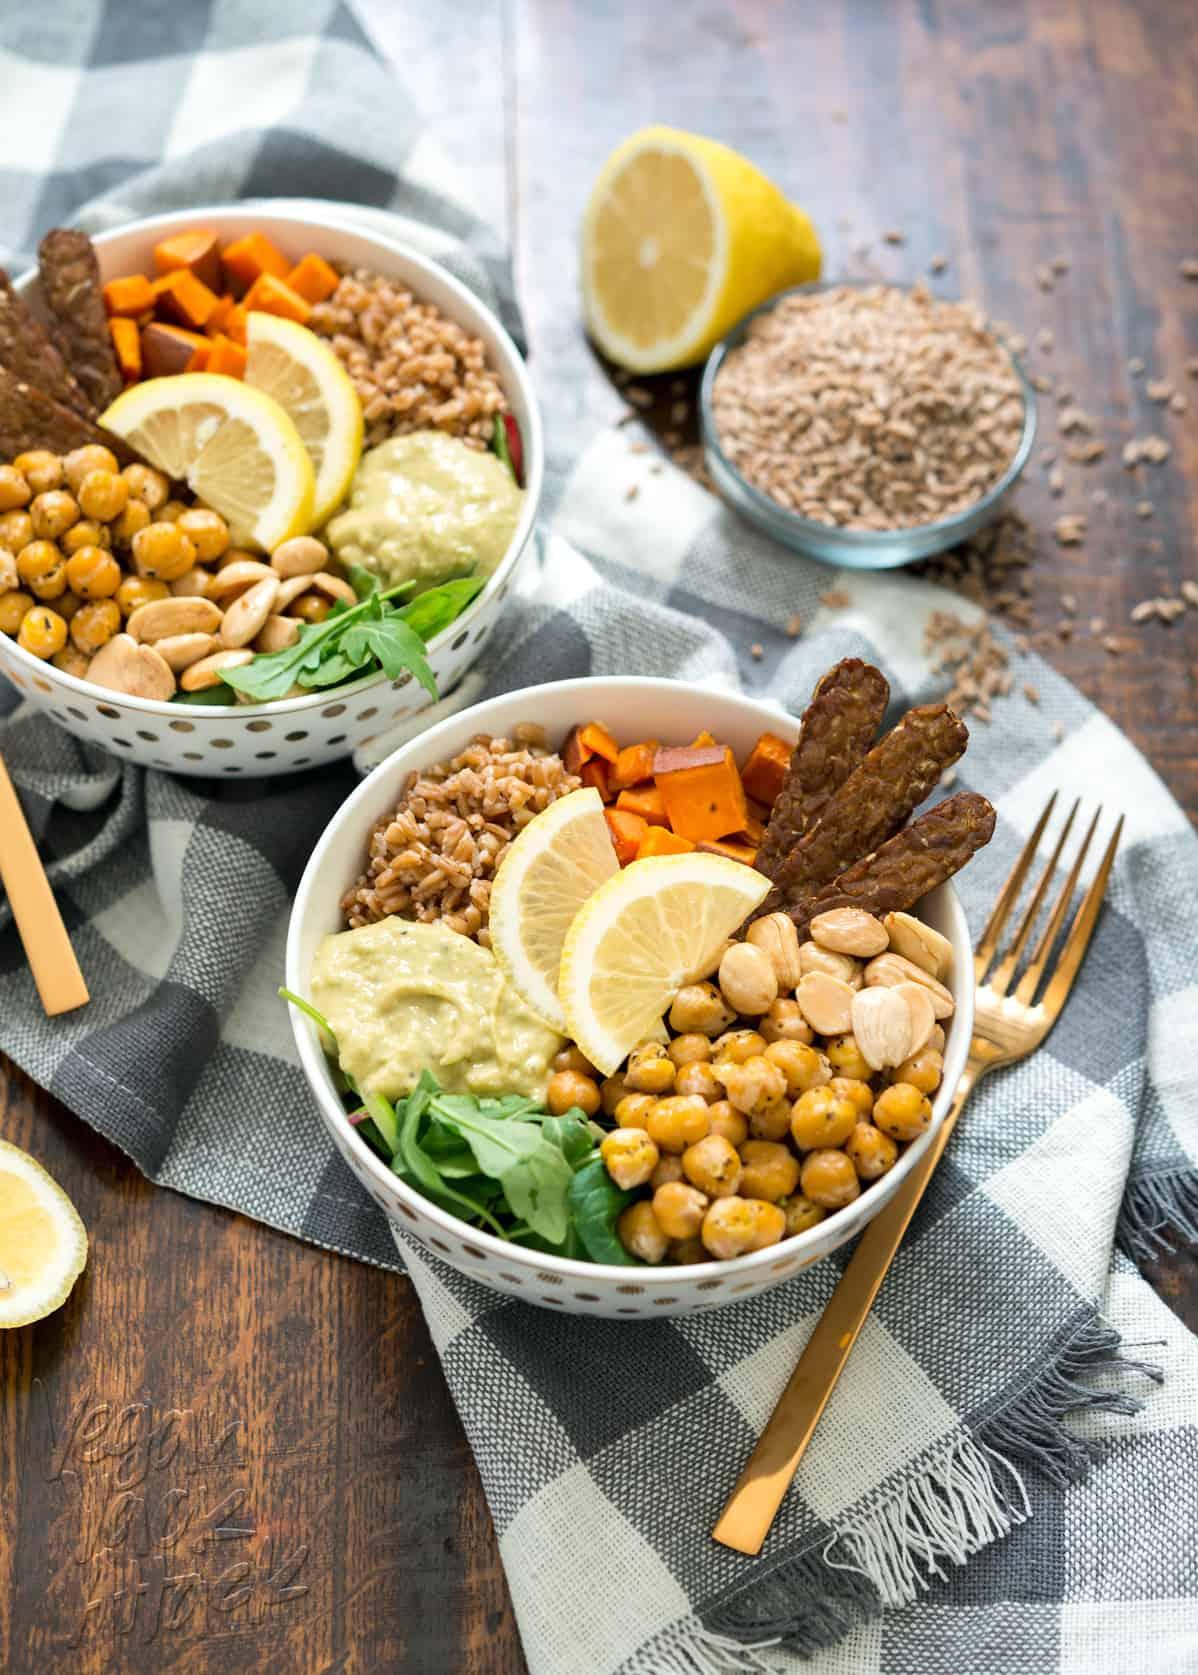 Vegan Fall Farro Protein Bowl - Healthy, filling, easy and delicious! @VeganYackAttack